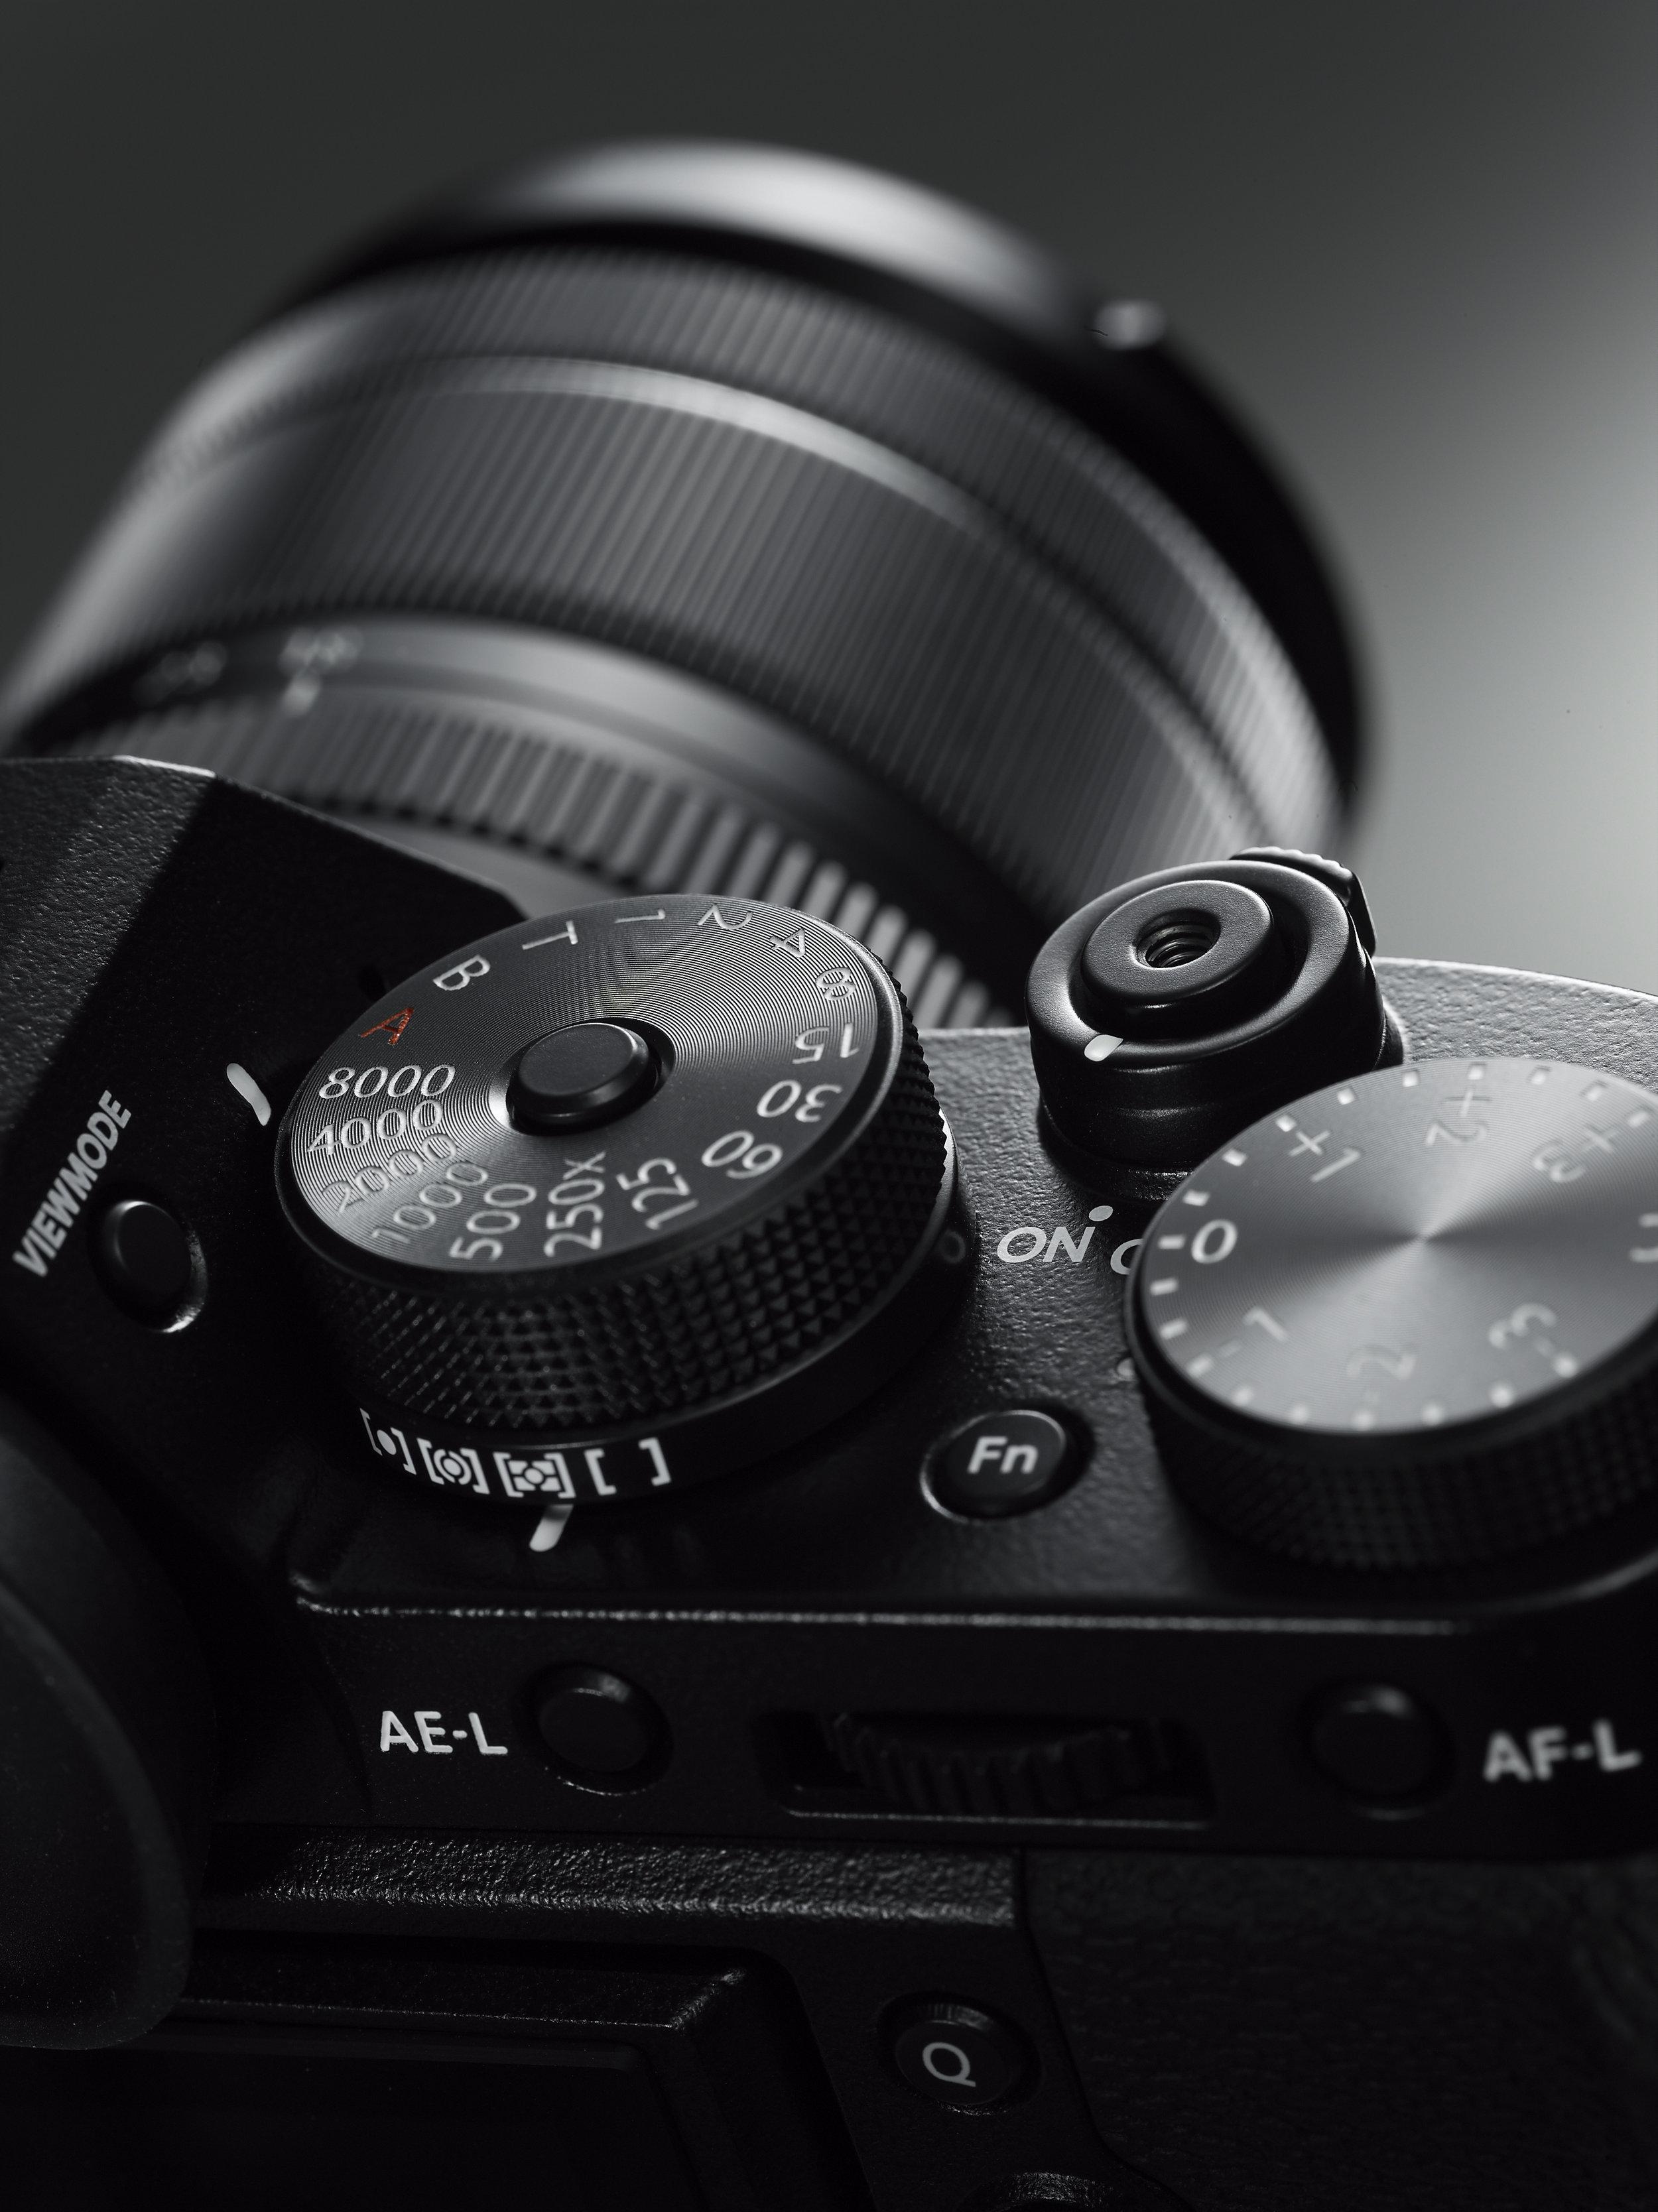 X-T2_dial_image5.jpg